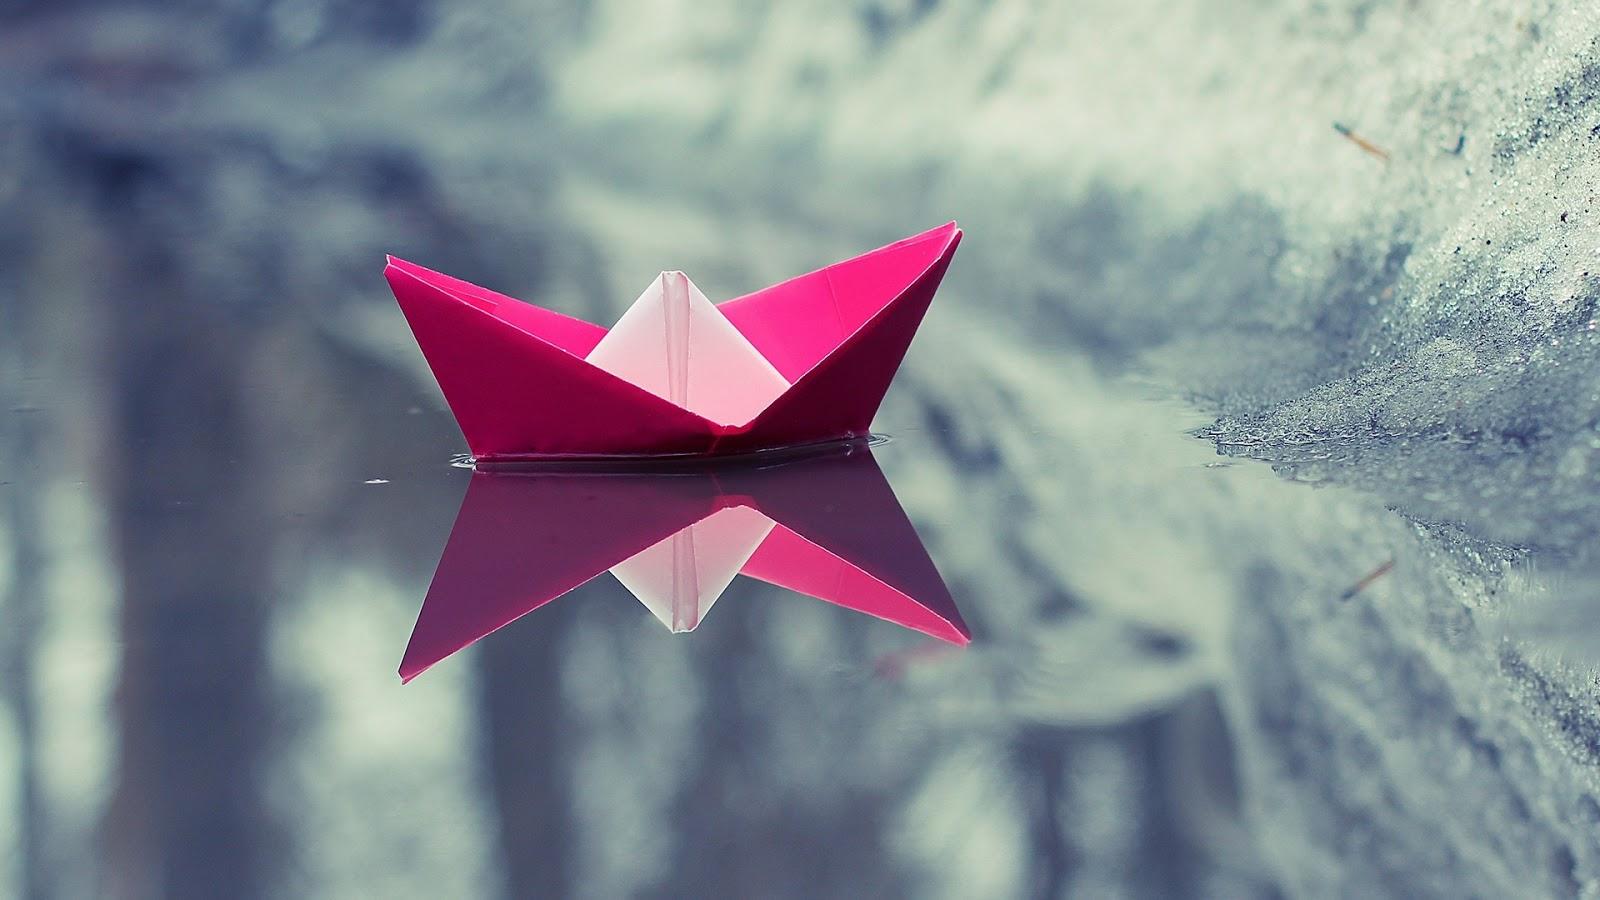 origami free wallpaper - photo #41